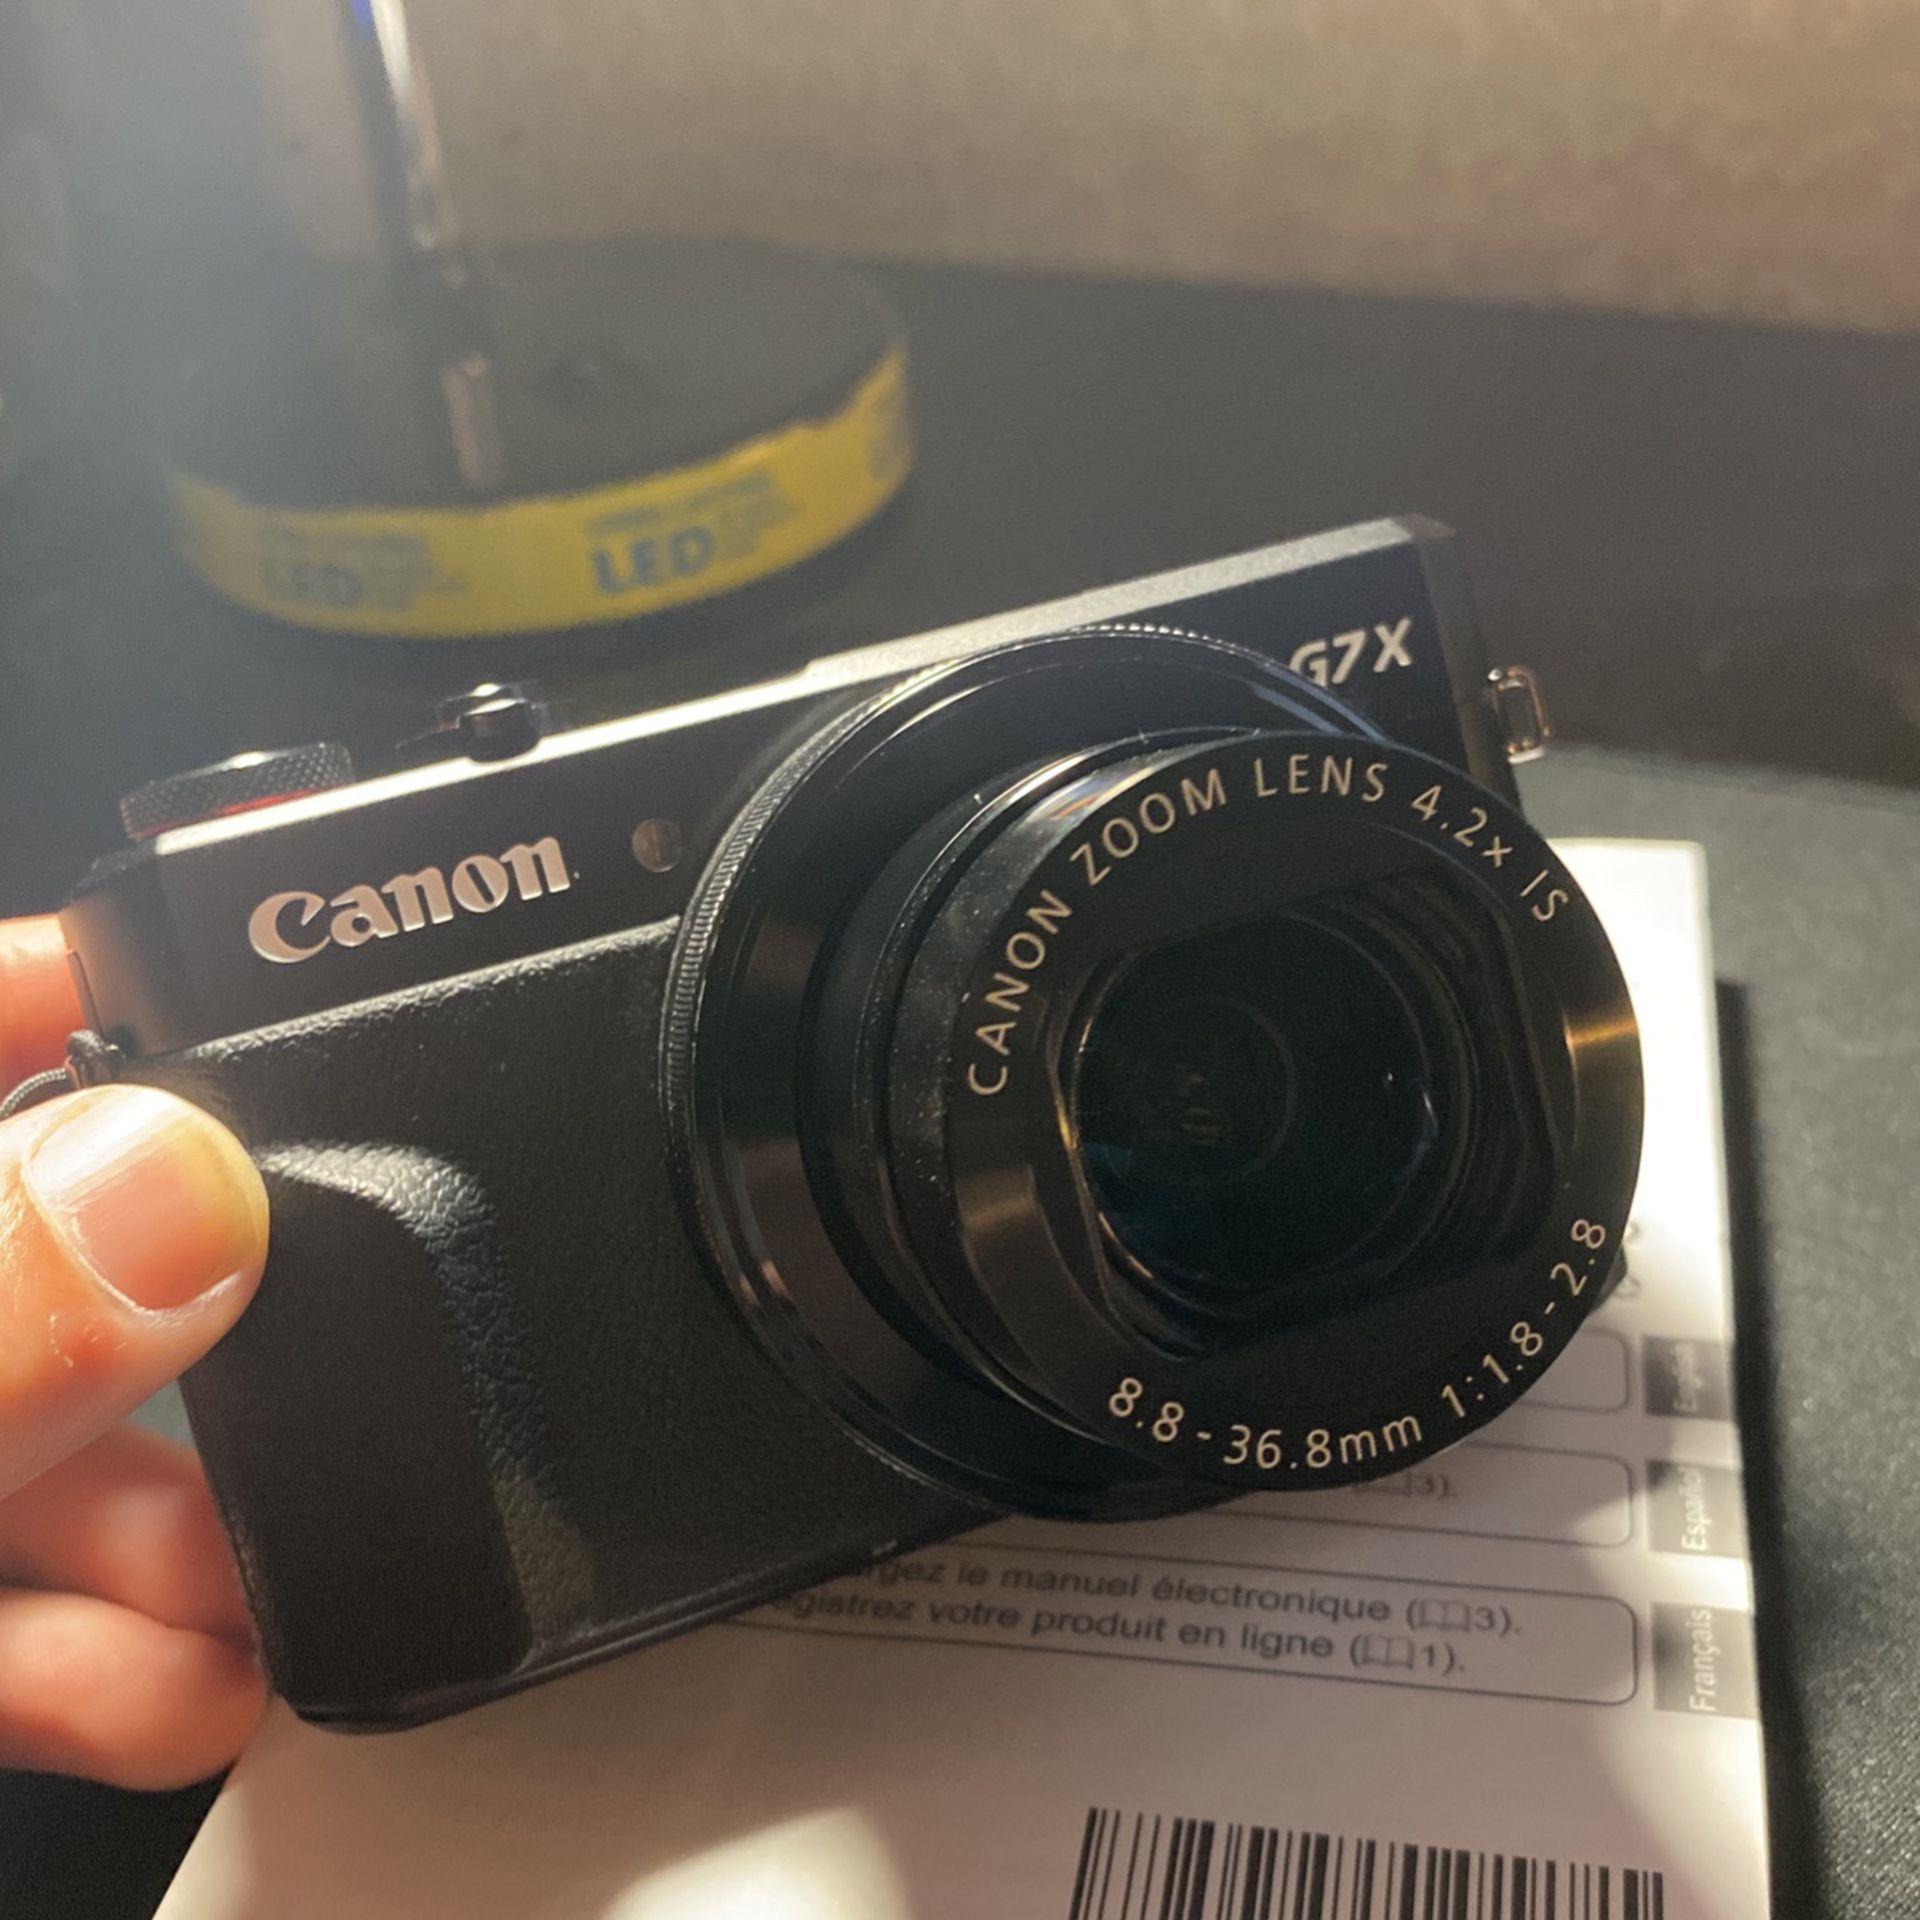 Canon Power Shot Digital Camera (G7 X Mark II)